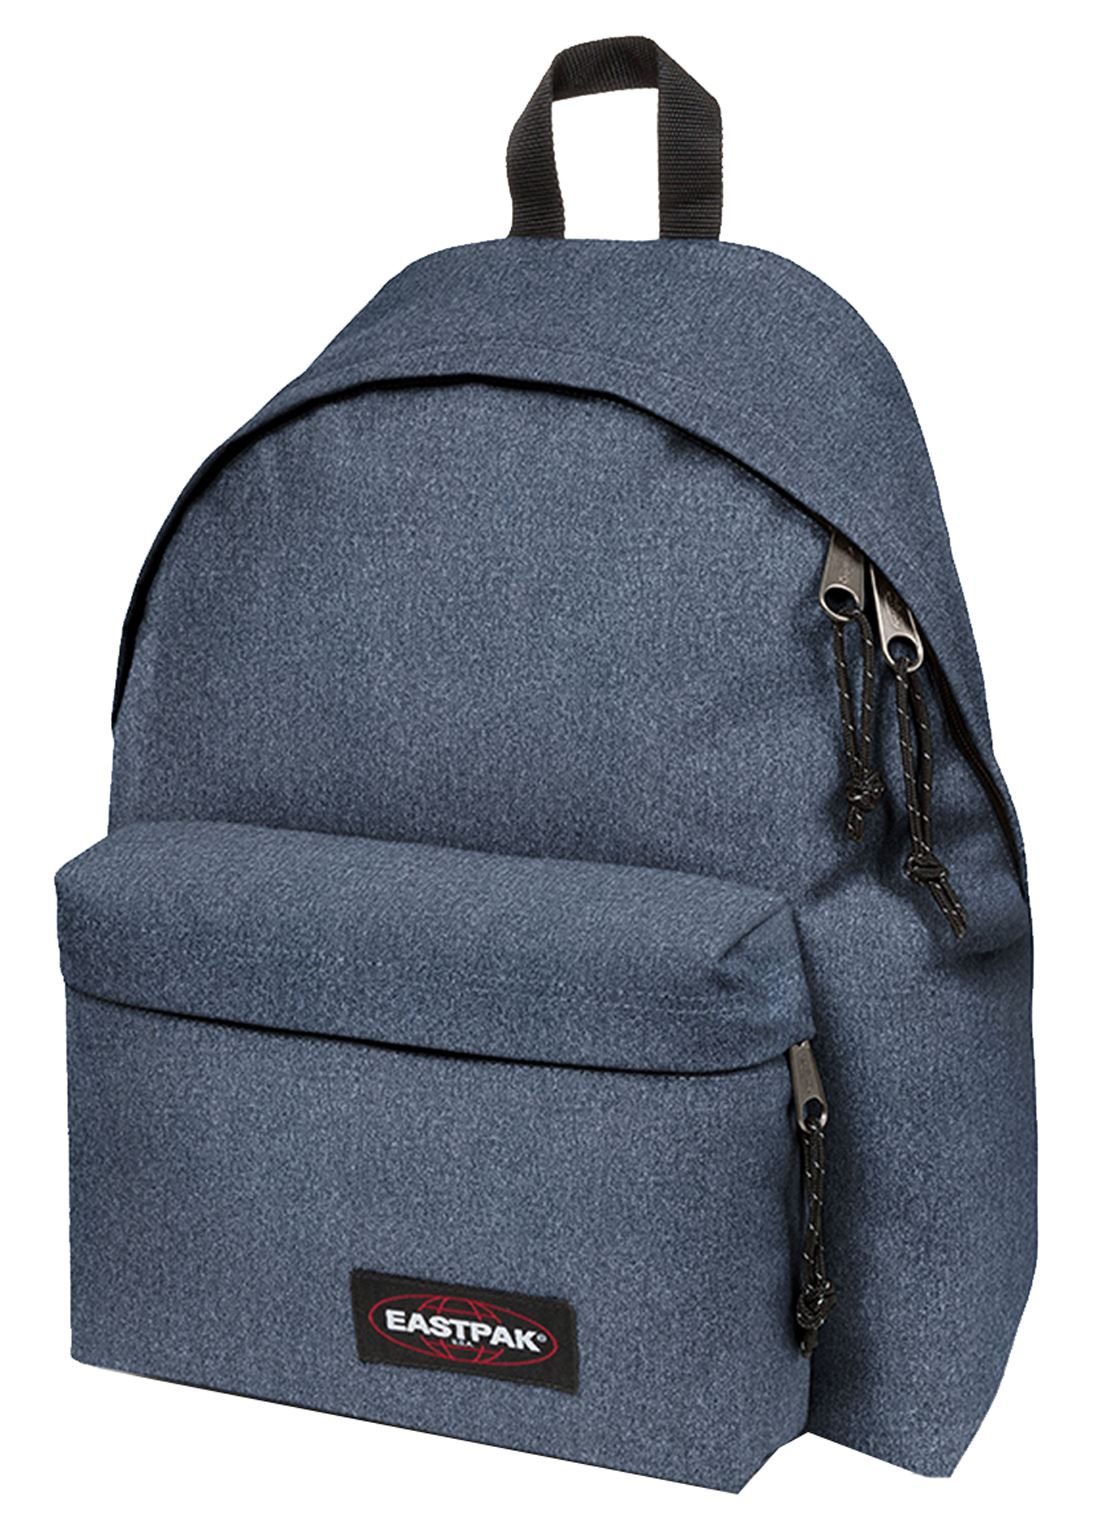 Eastpak Padded Pak R Backpack Black: EASTPAK Padded Pak'r Series Premium Large Rucksack